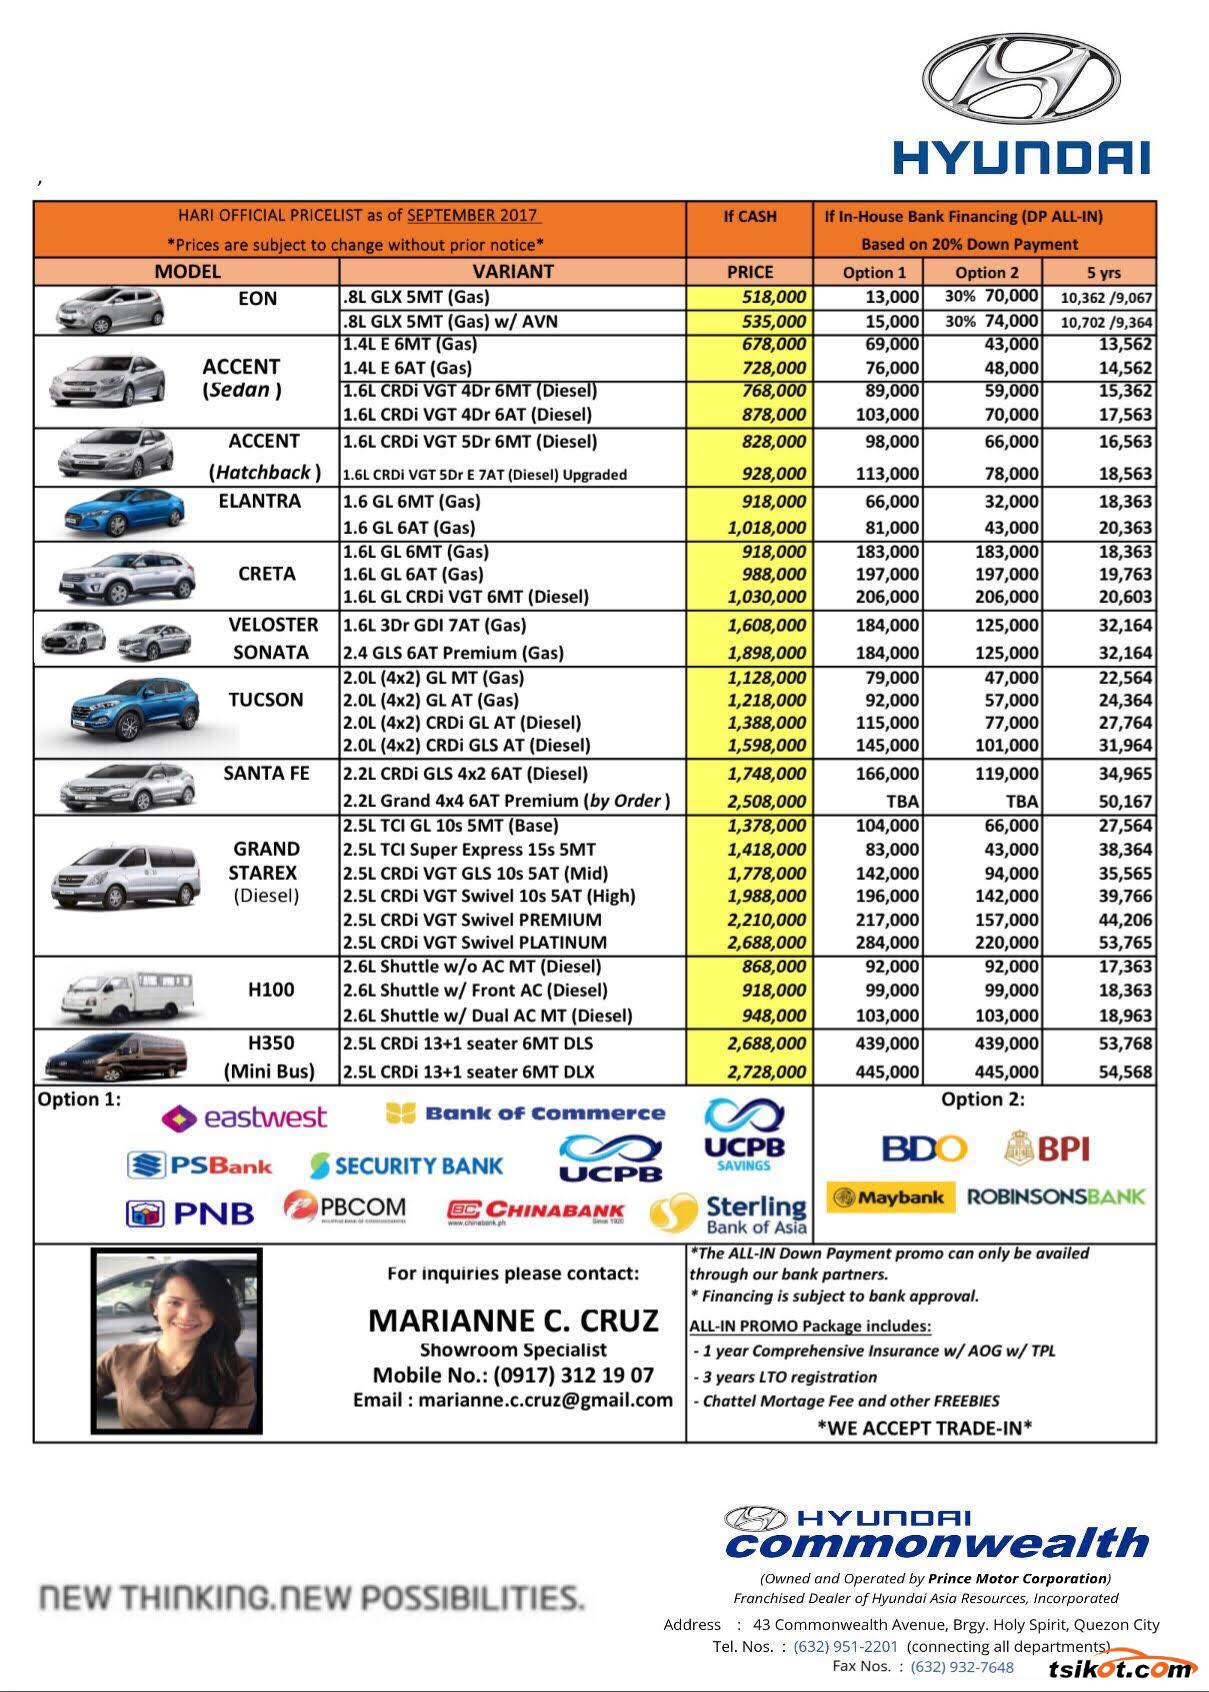 Hyundai Elantra 2017 - 2